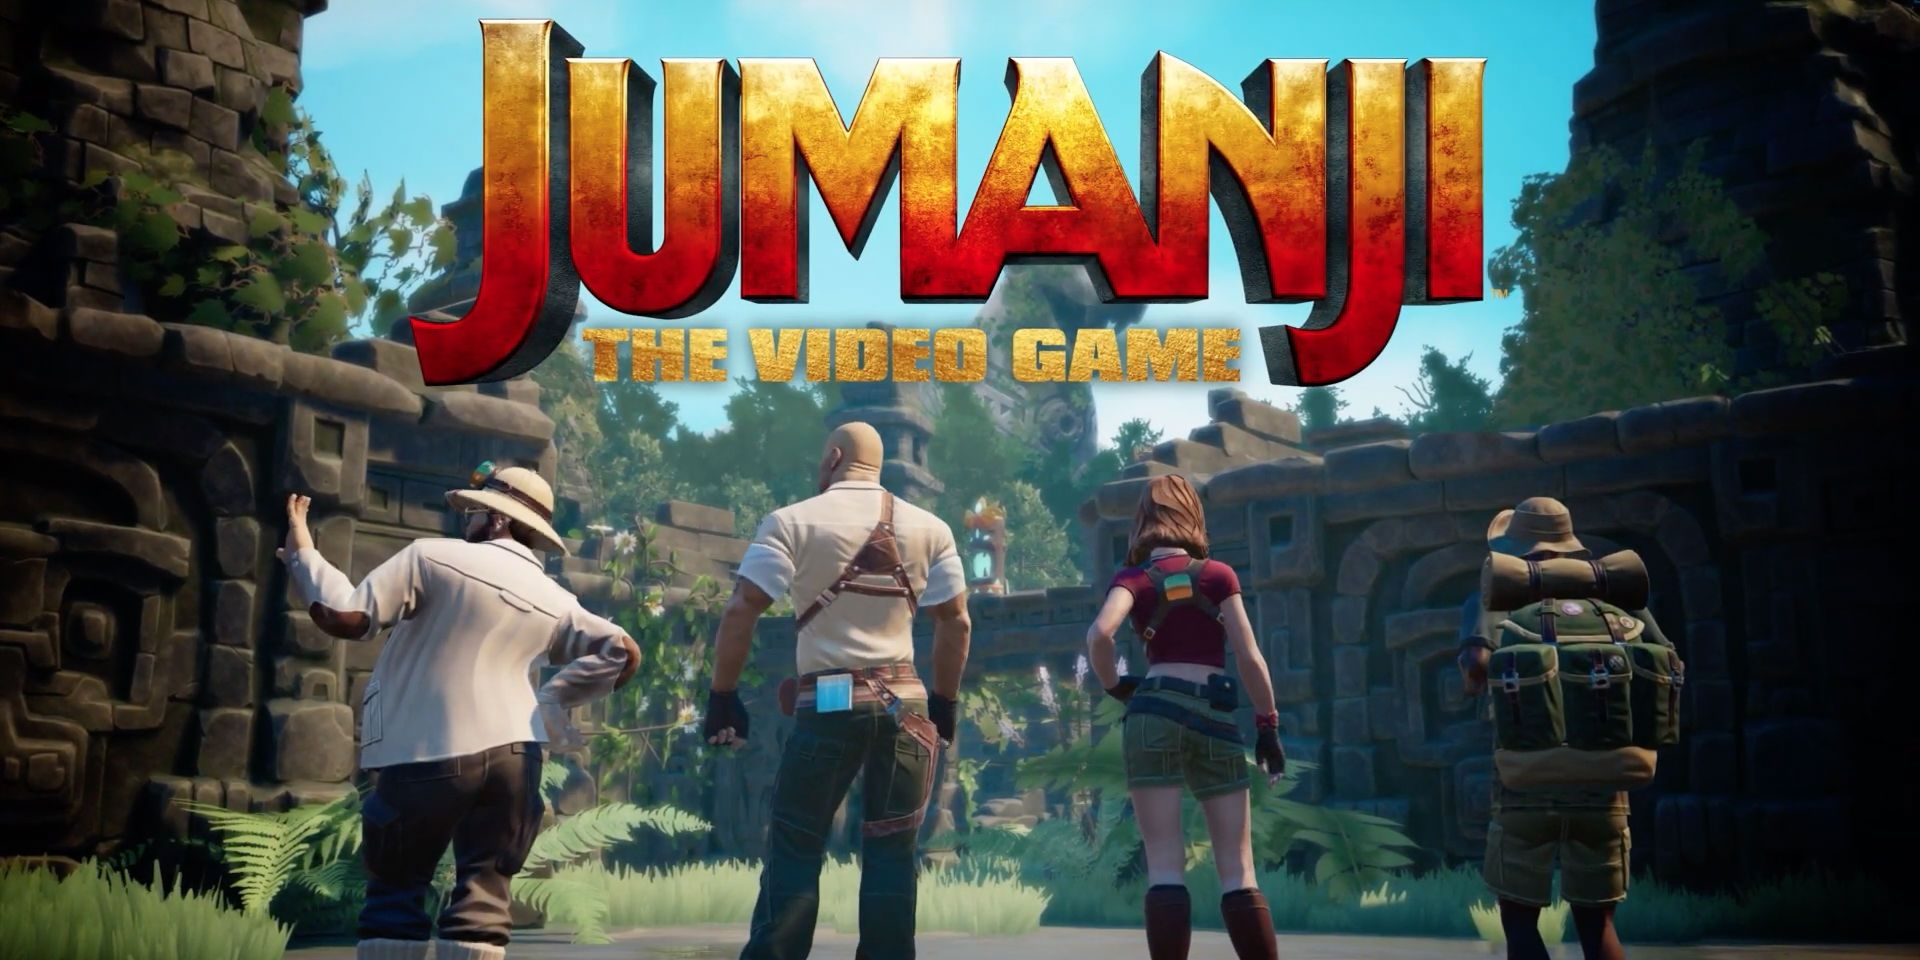 jumanji video game reviews - Jumanji: The Video Game: Everything you need to know  iMore Manga Art Style